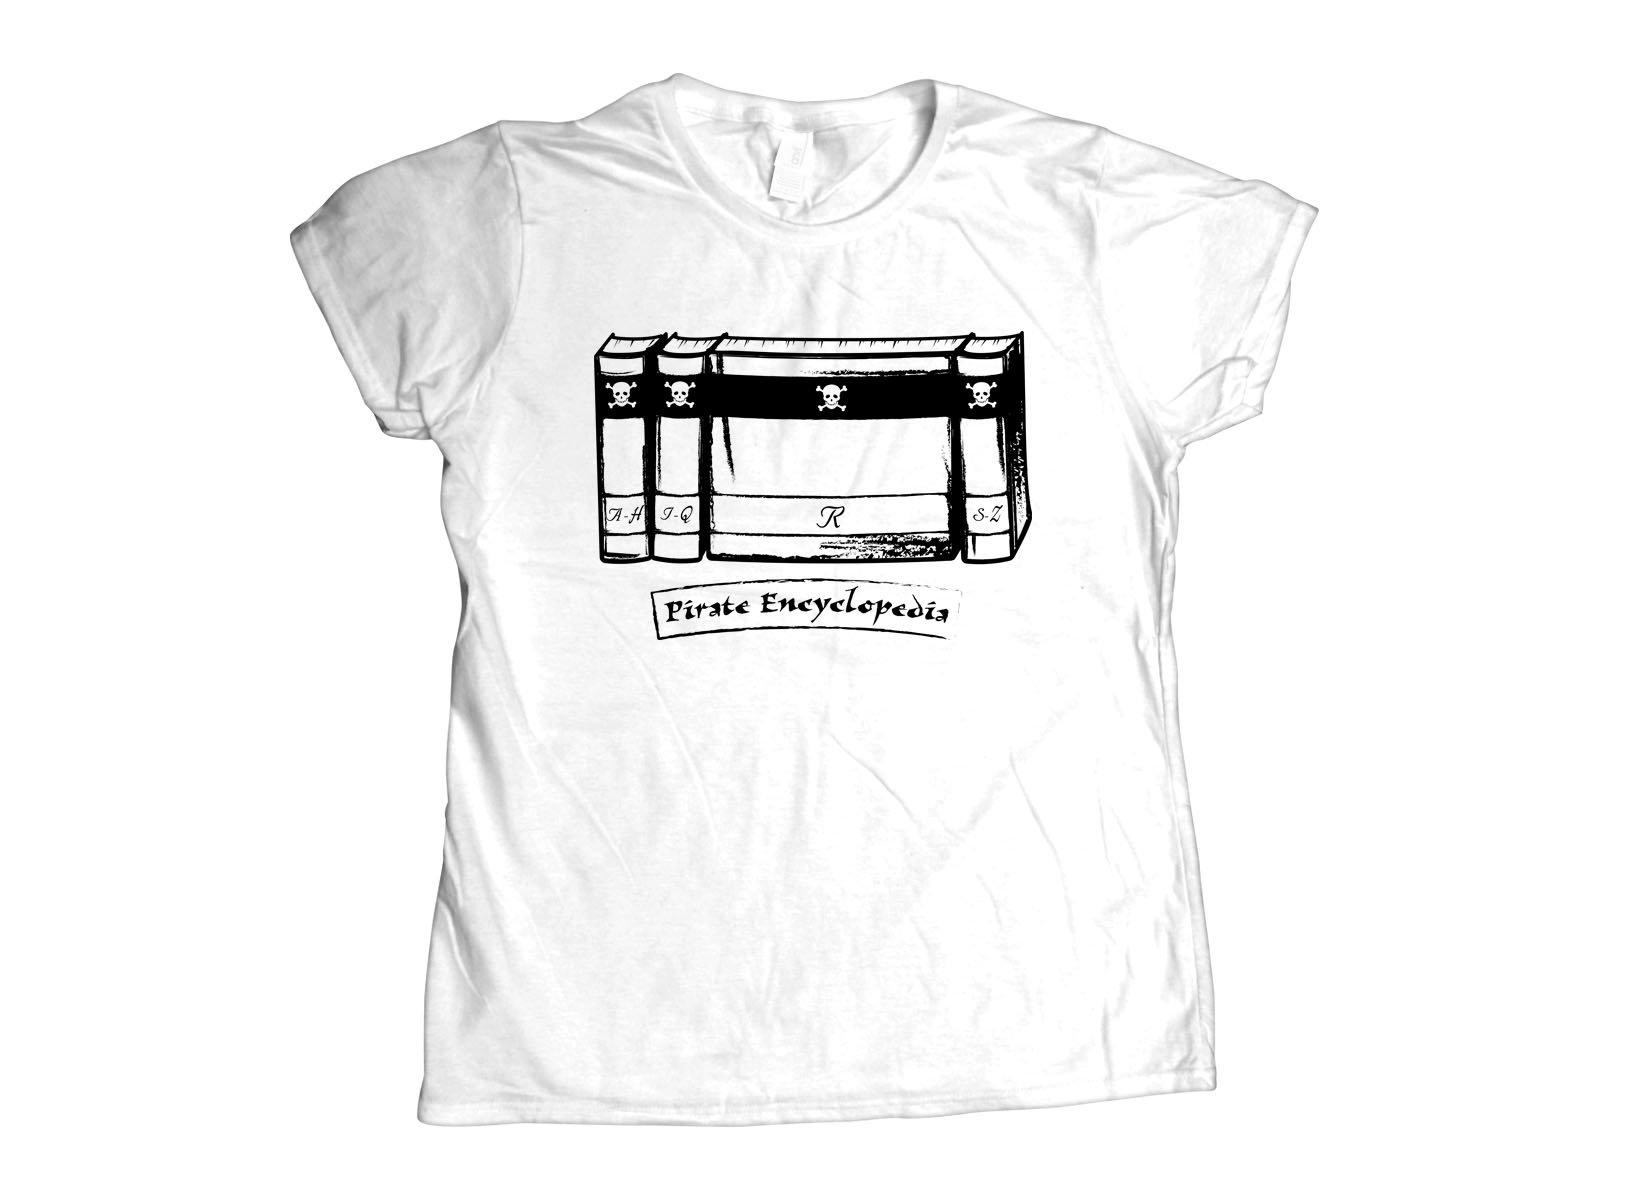 Pirate Encyclopedia on Womens T-Shirt